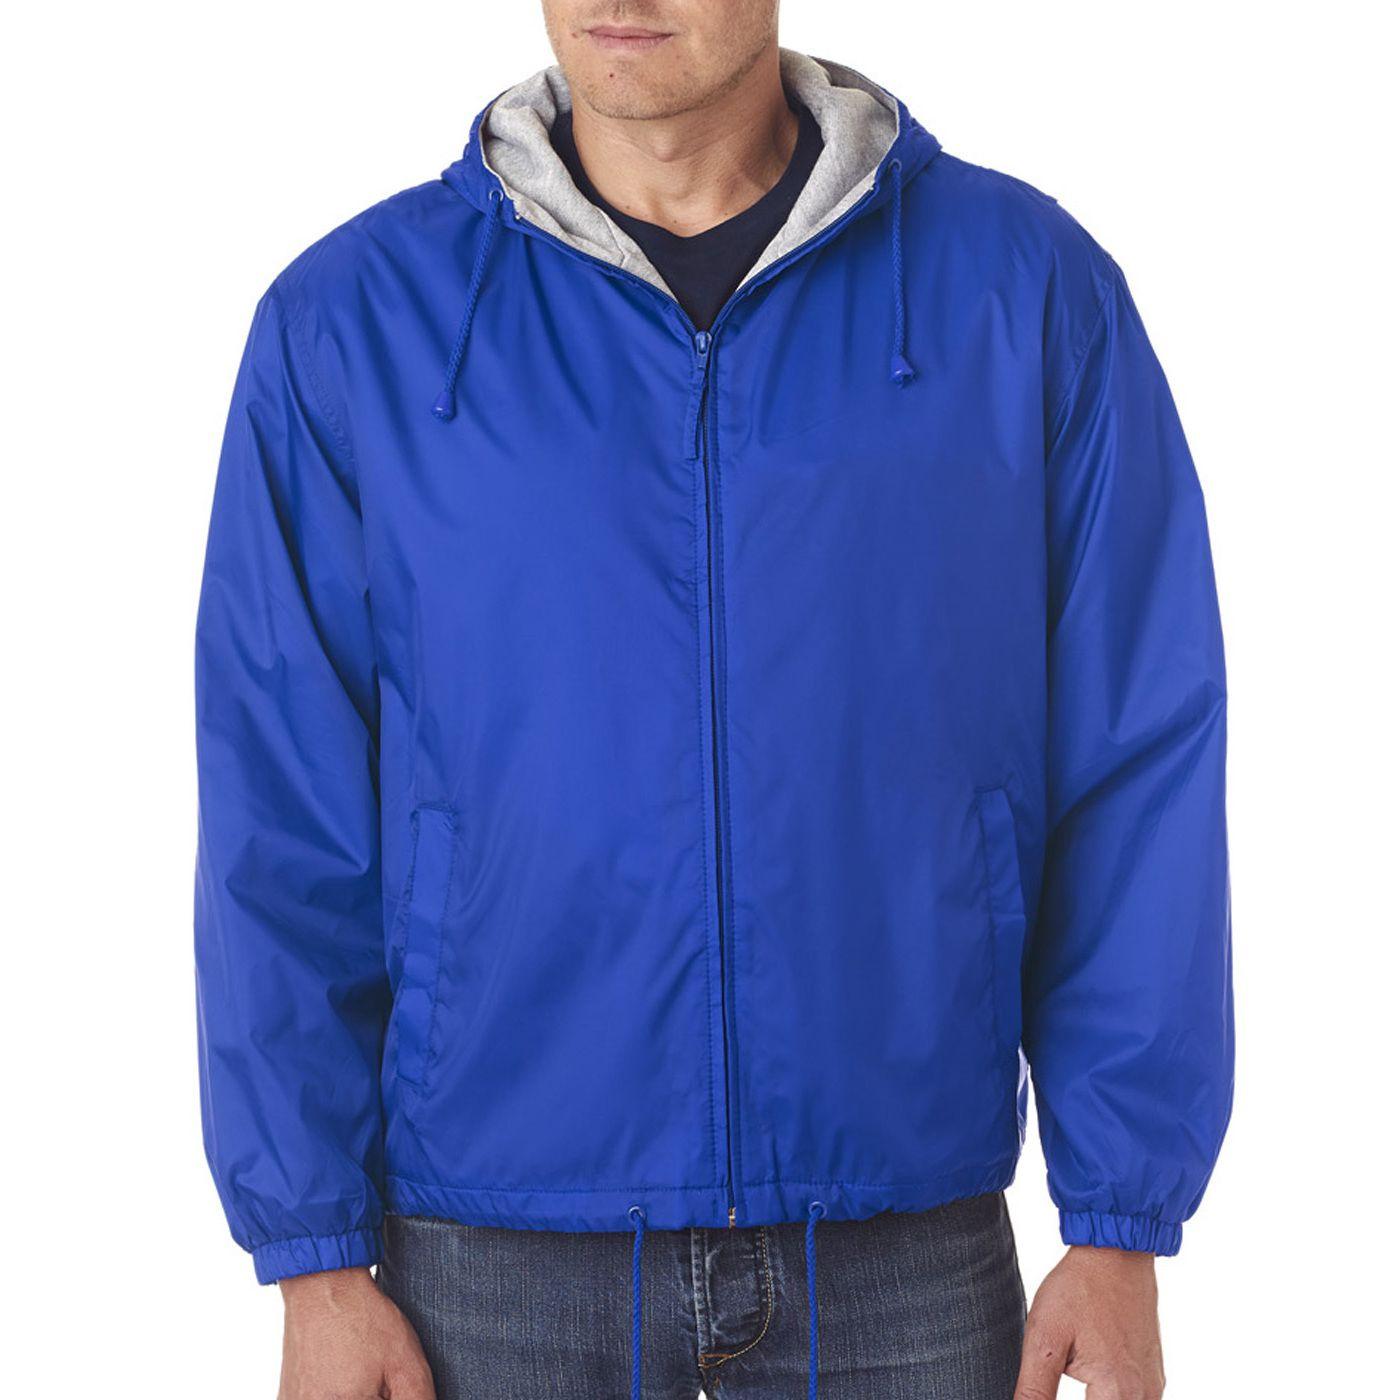 Men's Royal -Lined Hooded Jacket